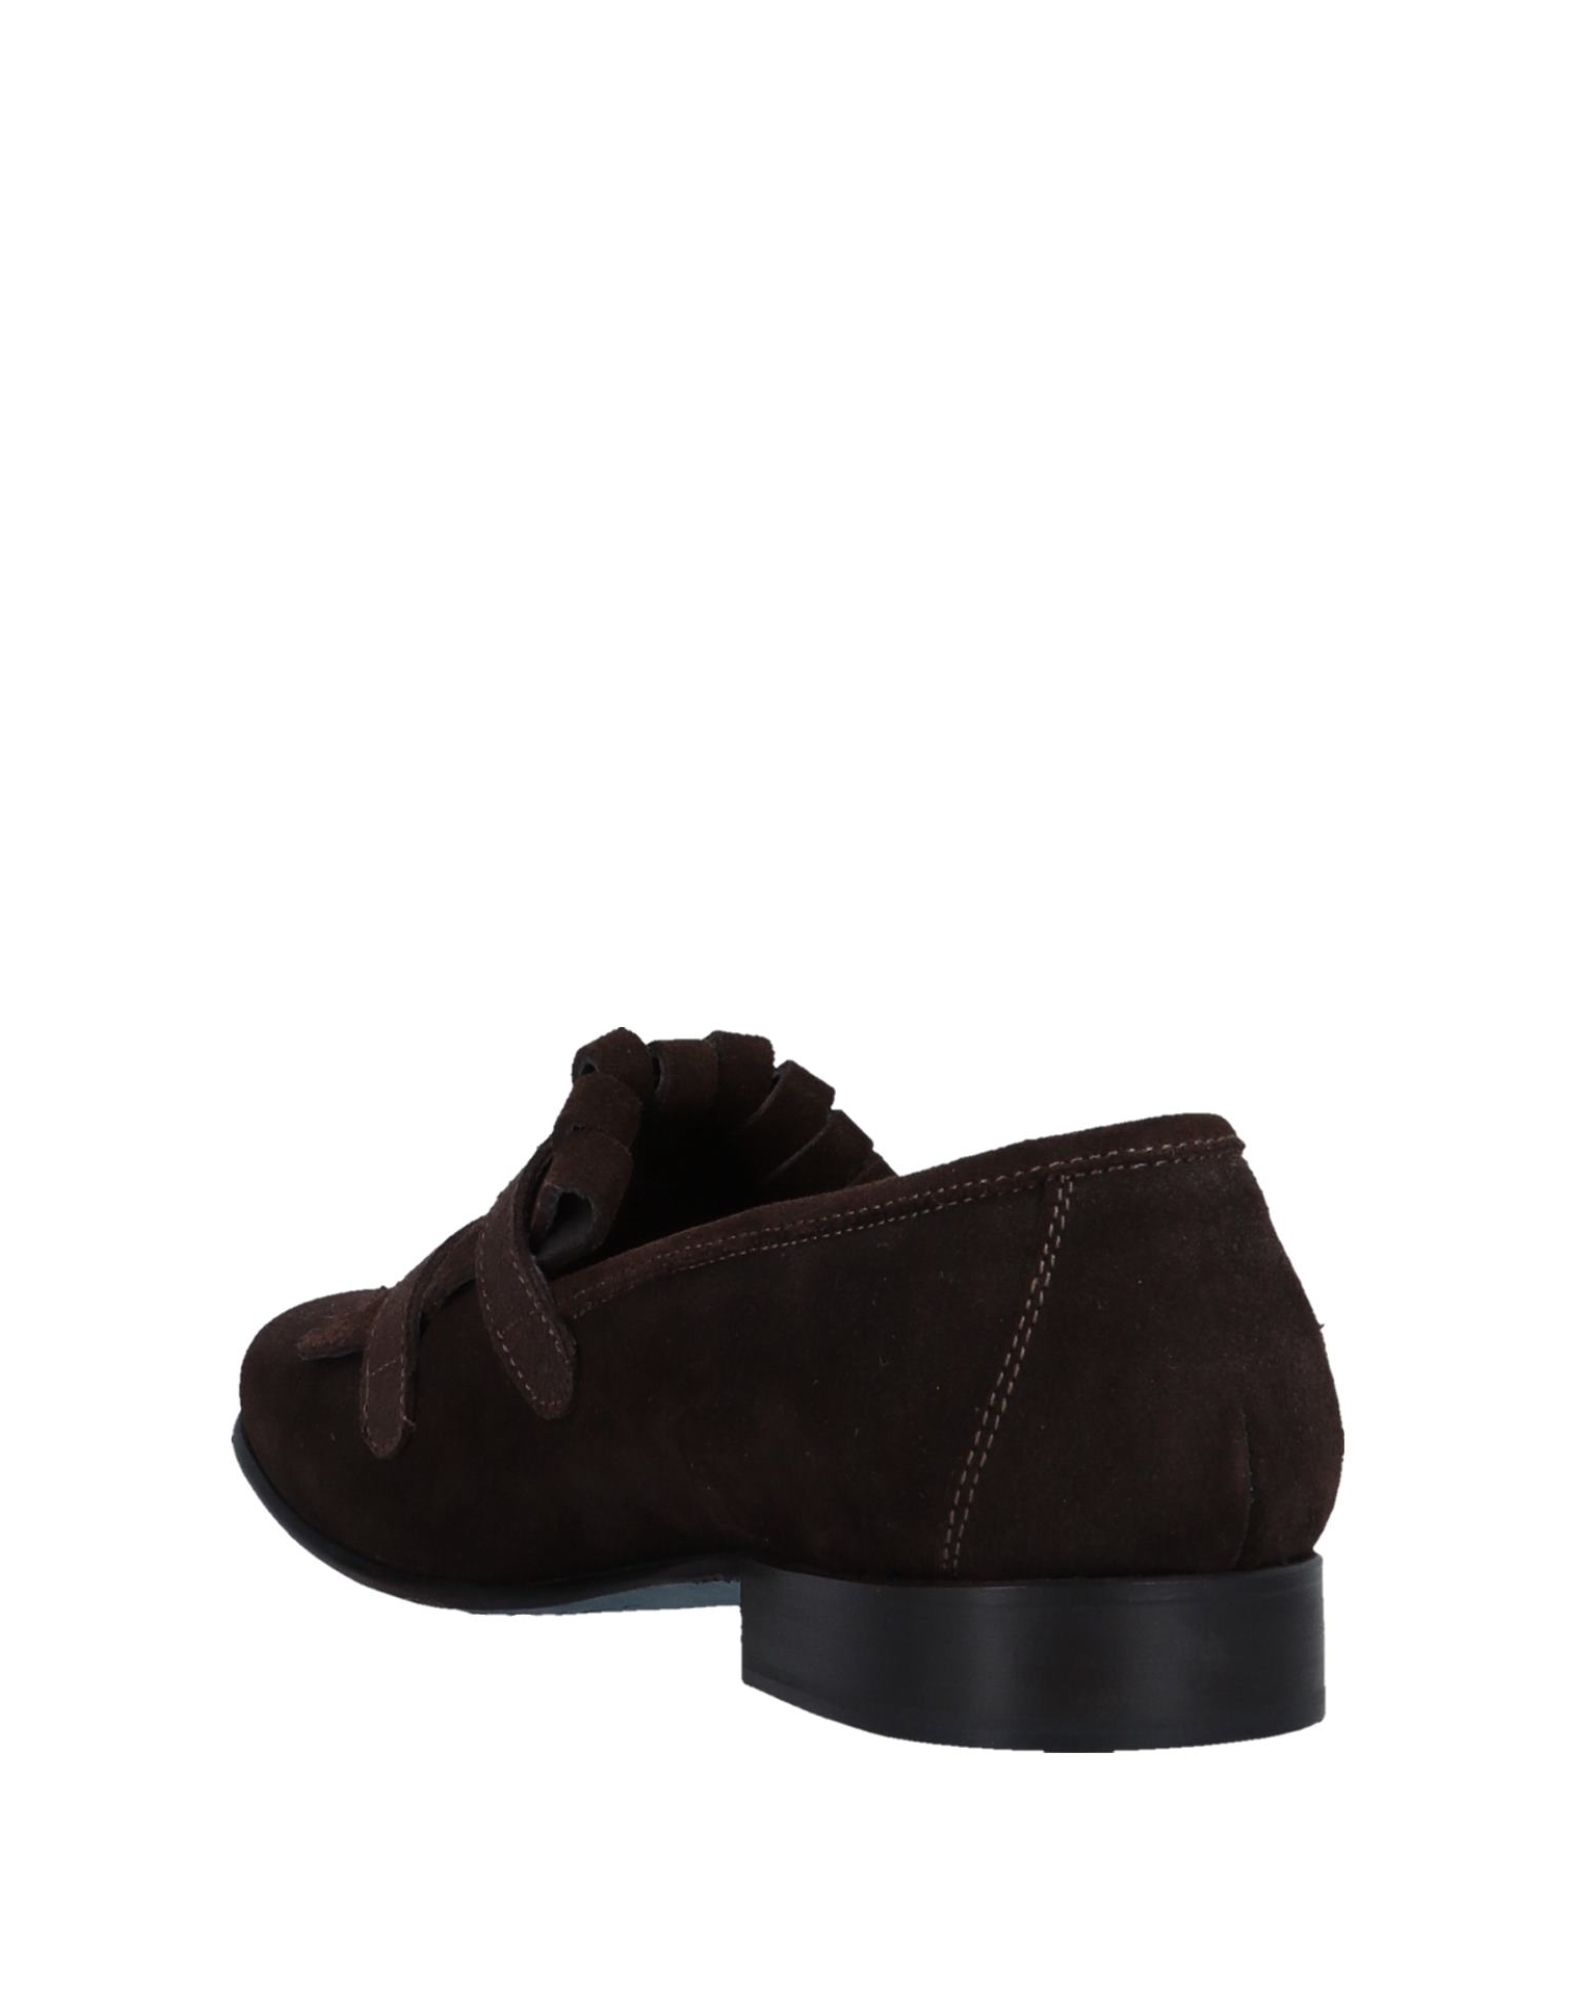 Daniele Alessandrini Gute Mokassins Herren  11558617DX Gute Alessandrini Qualität beliebte Schuhe 44c16a